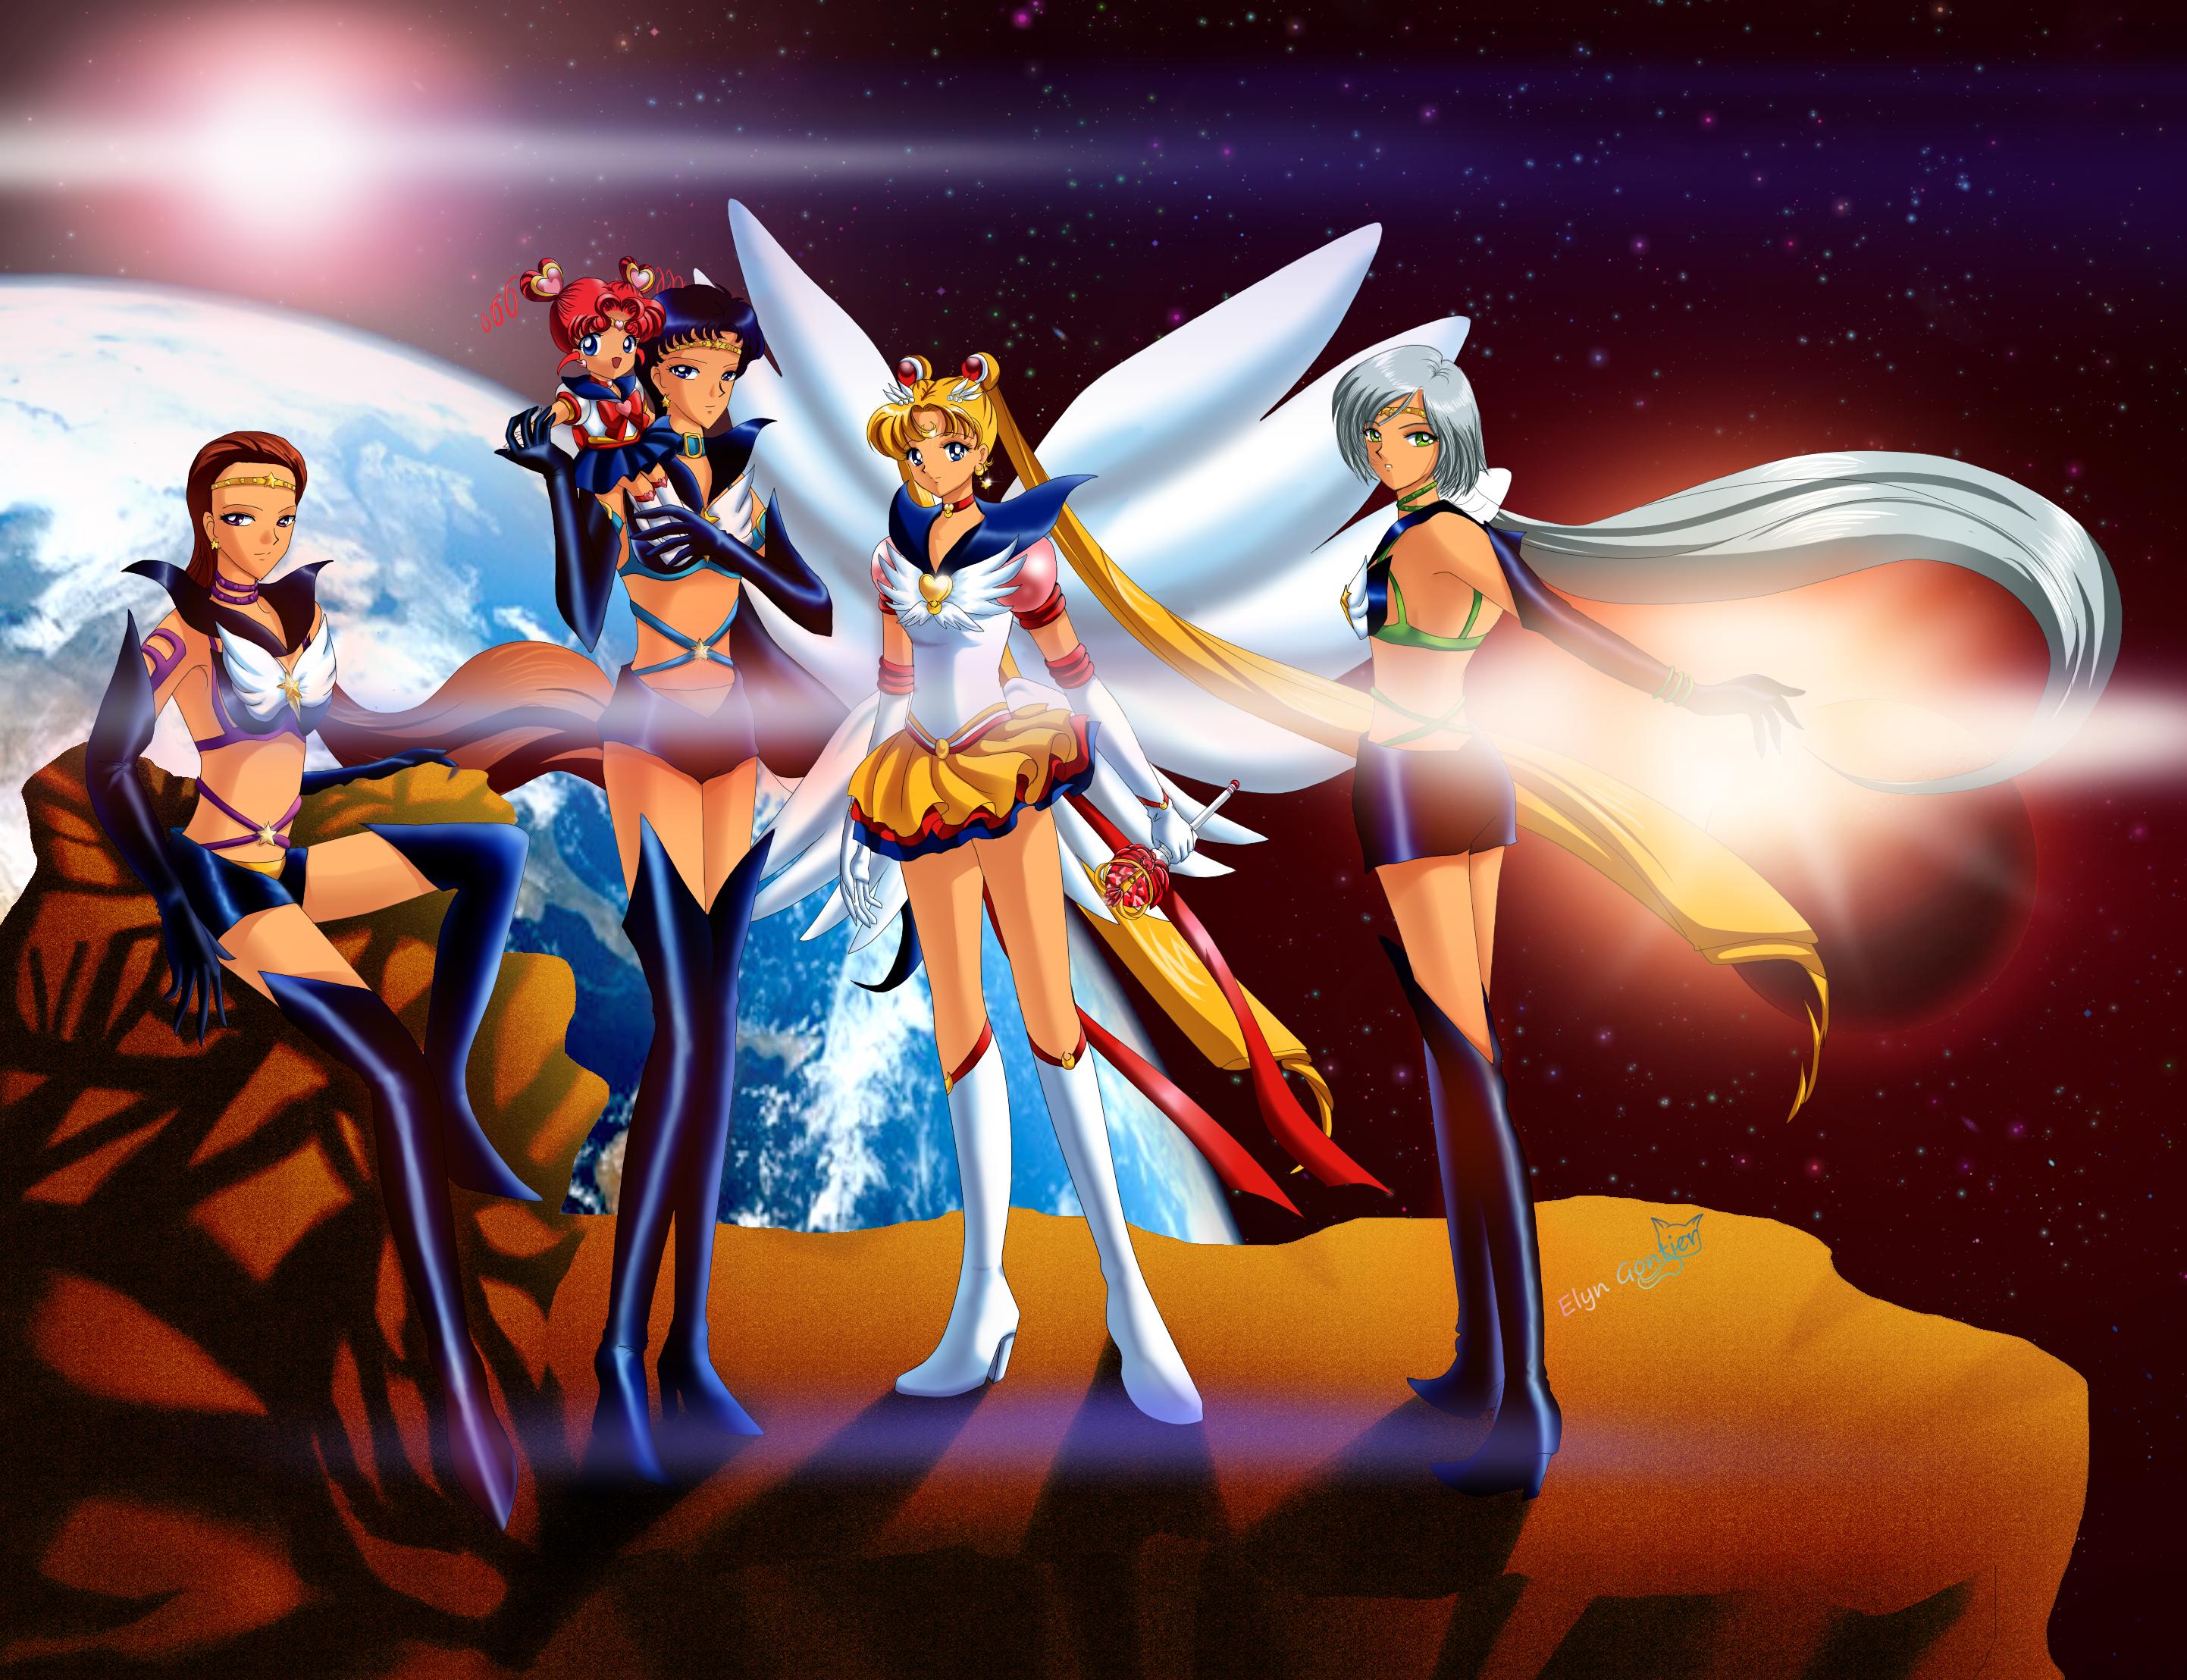 Anime SAILOR MOON Wallpaper HD Sailor Moon HD Wallpapers